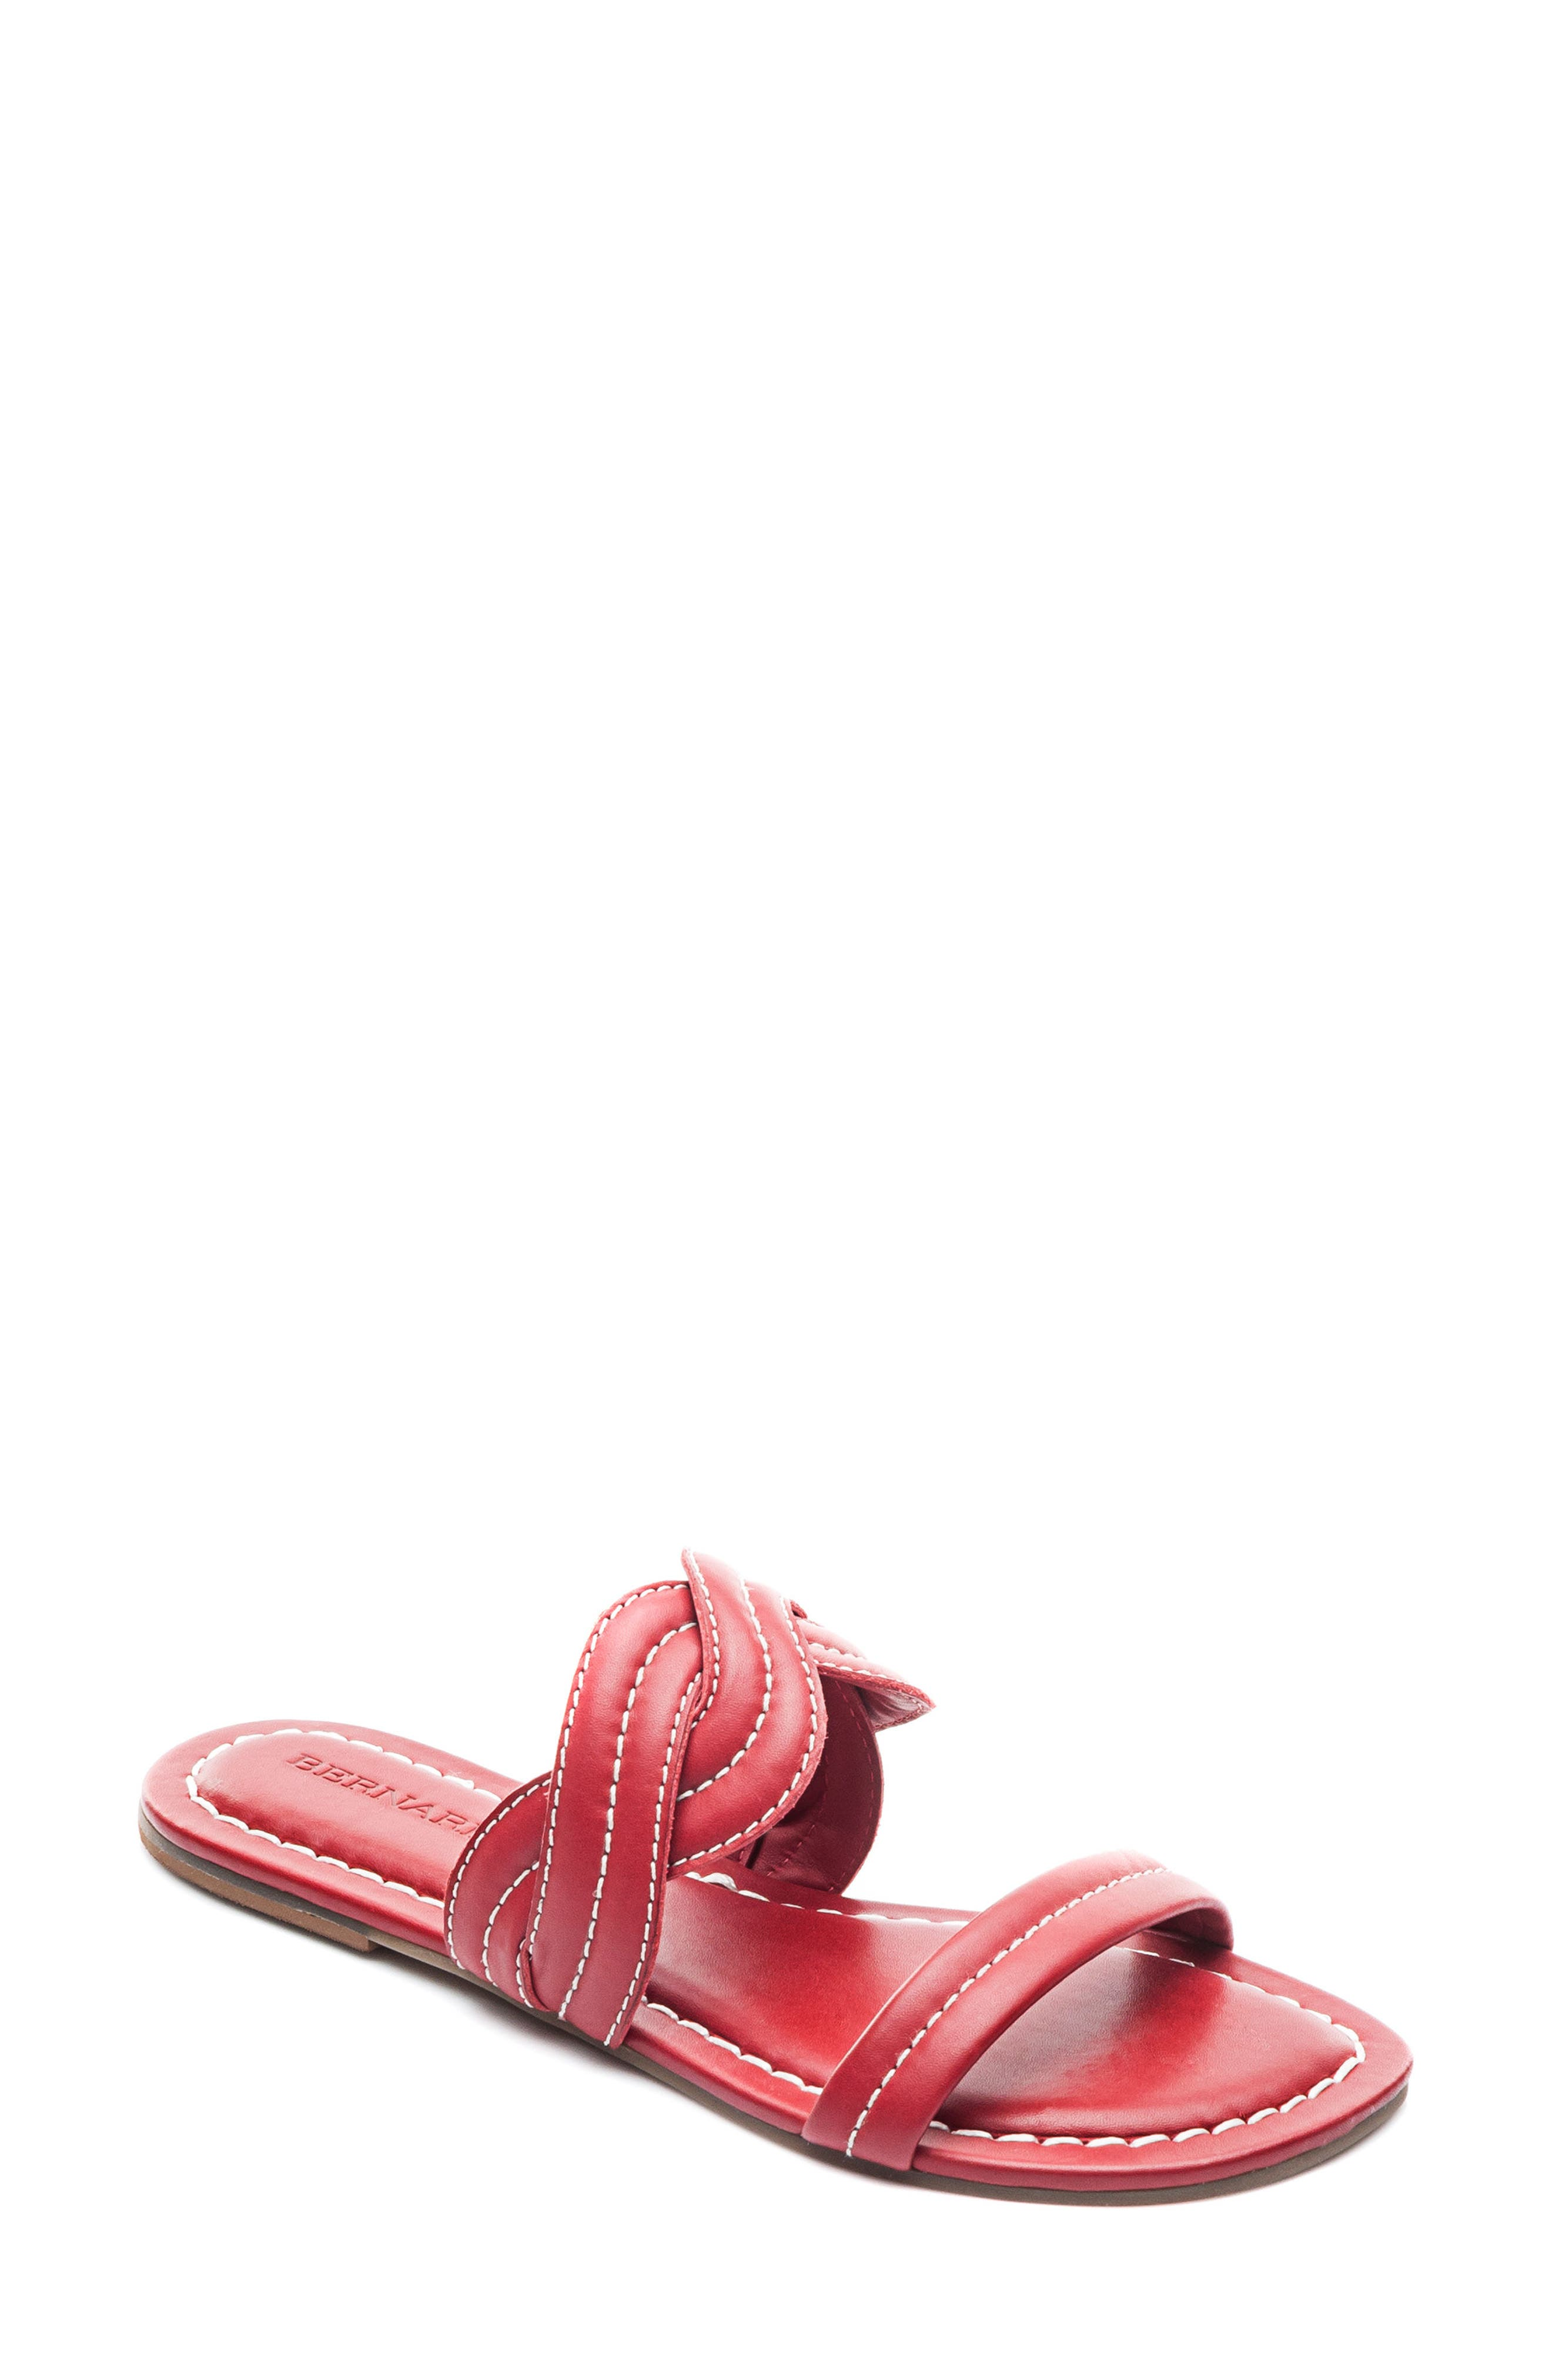 Bernardo Mirian Slide Sandal,                             Main thumbnail 1, color,                             Red Leather